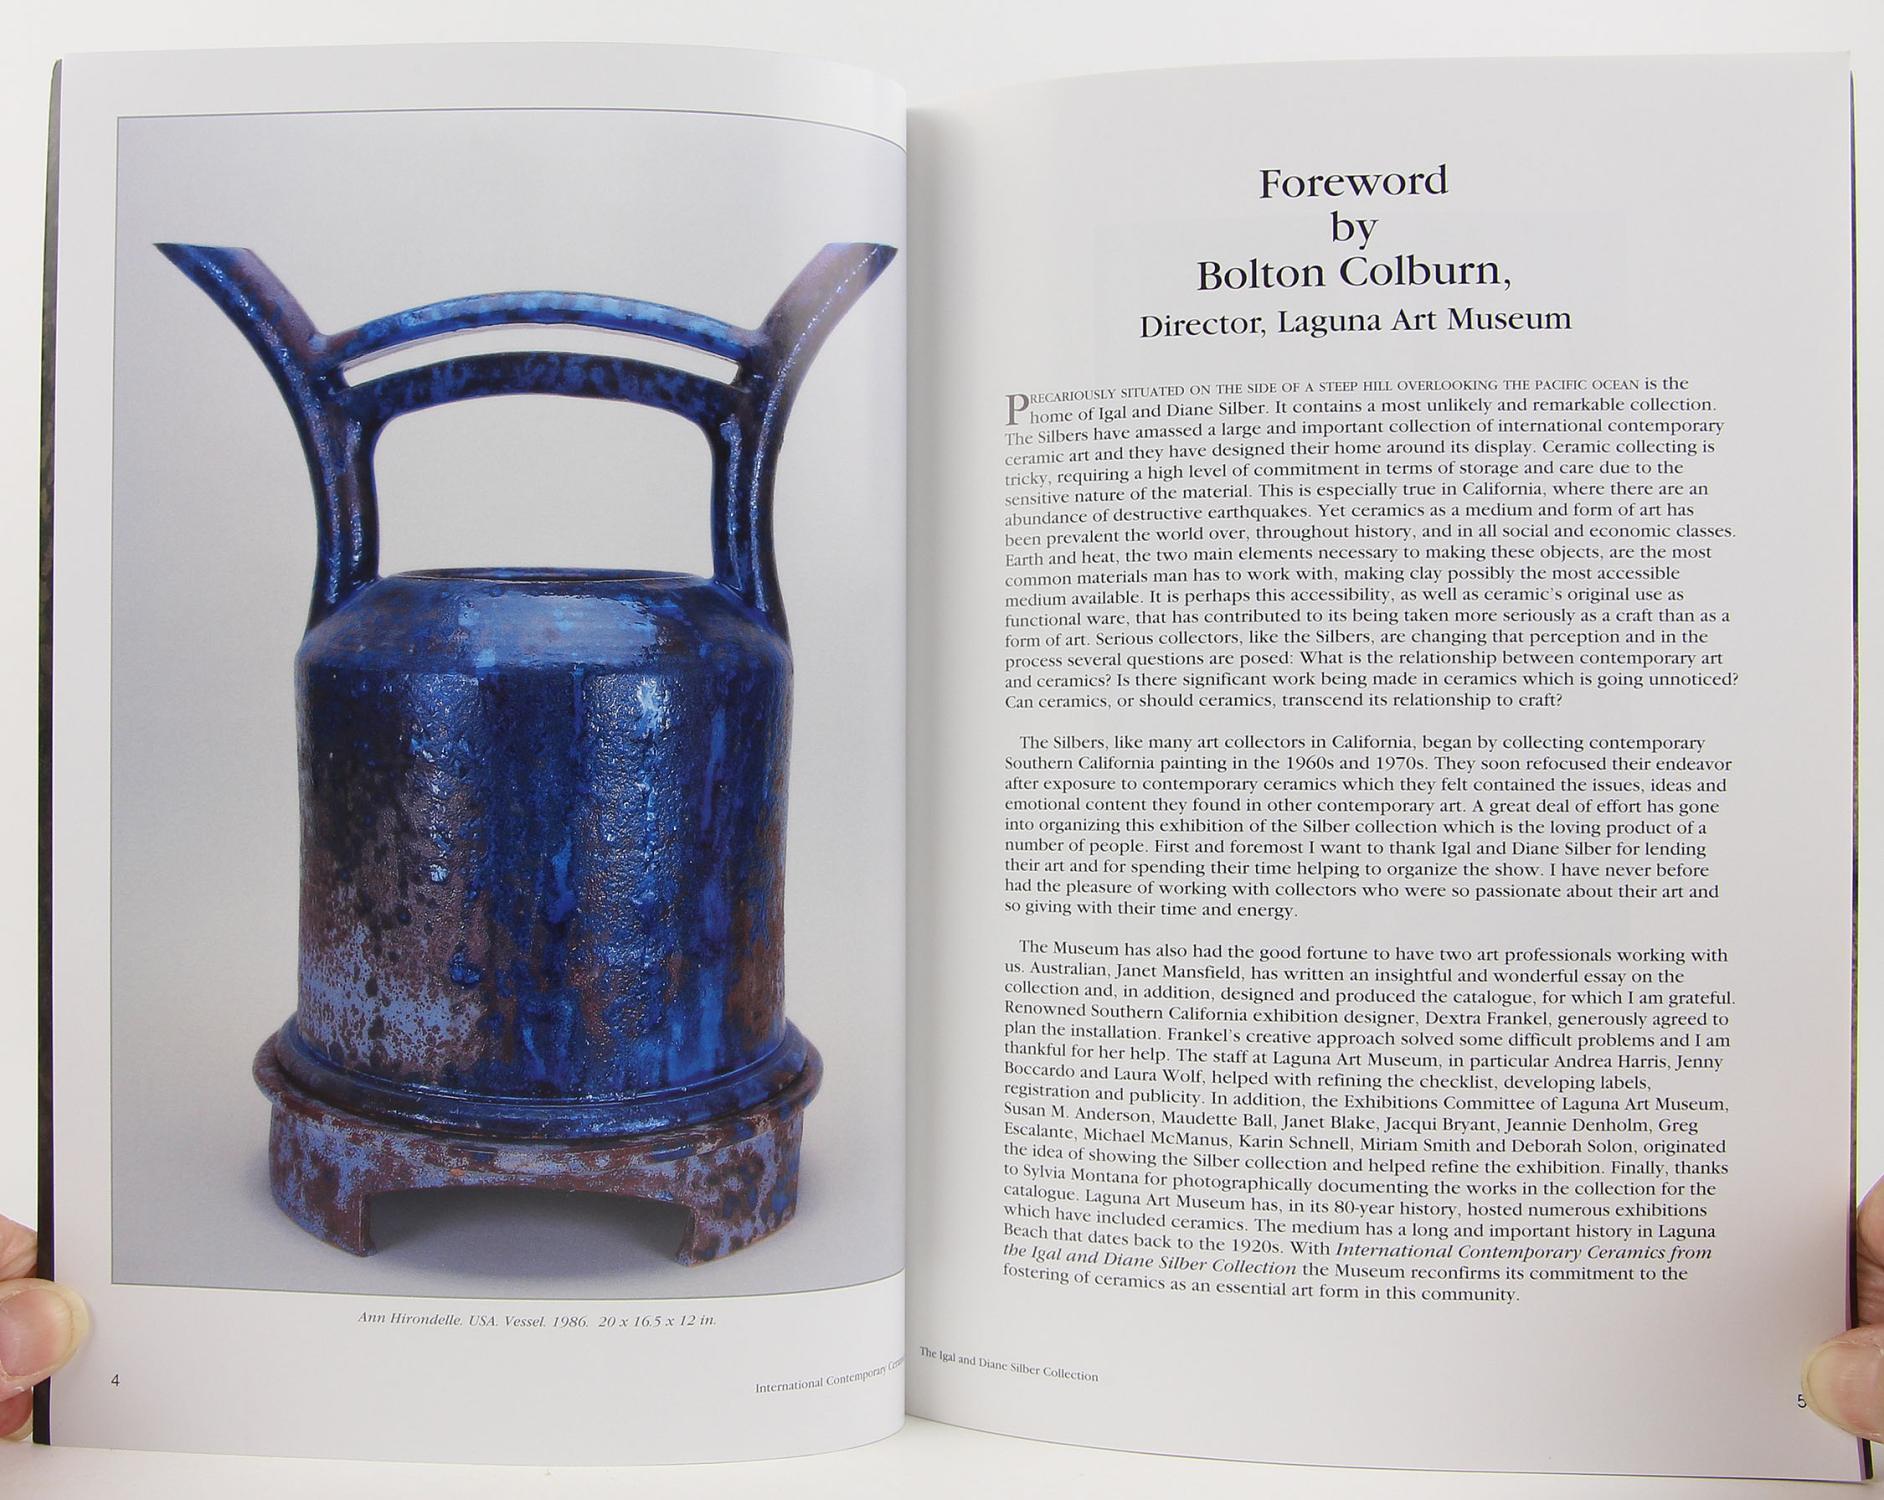 International Contemporary Ceramics from the